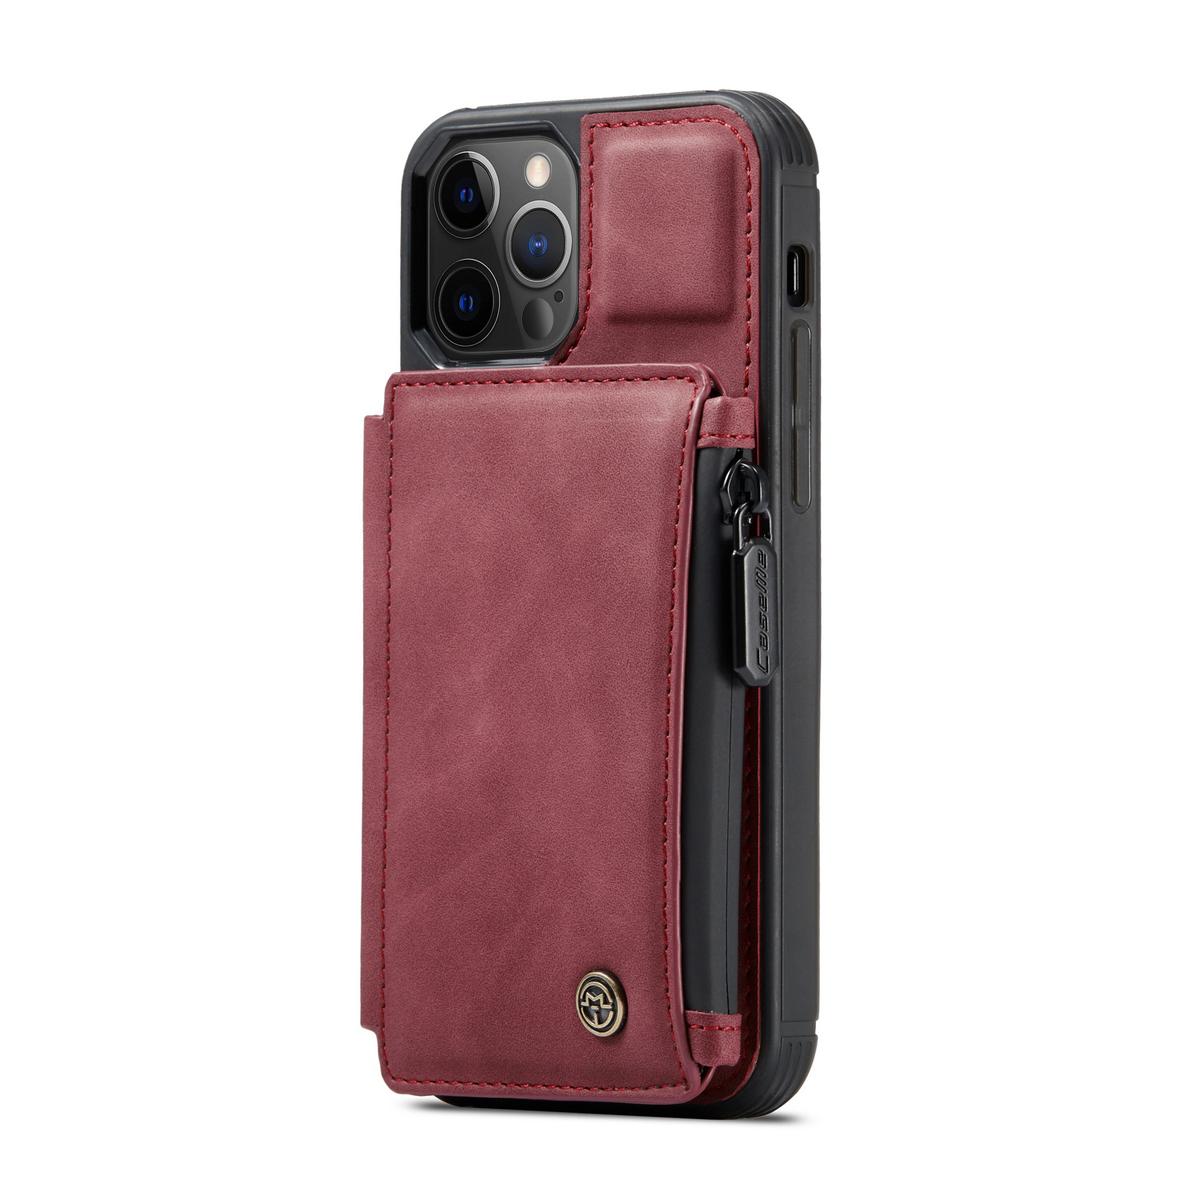 CaseMe C20 Series läderfodral till iPhone 12/12 Pro, röd